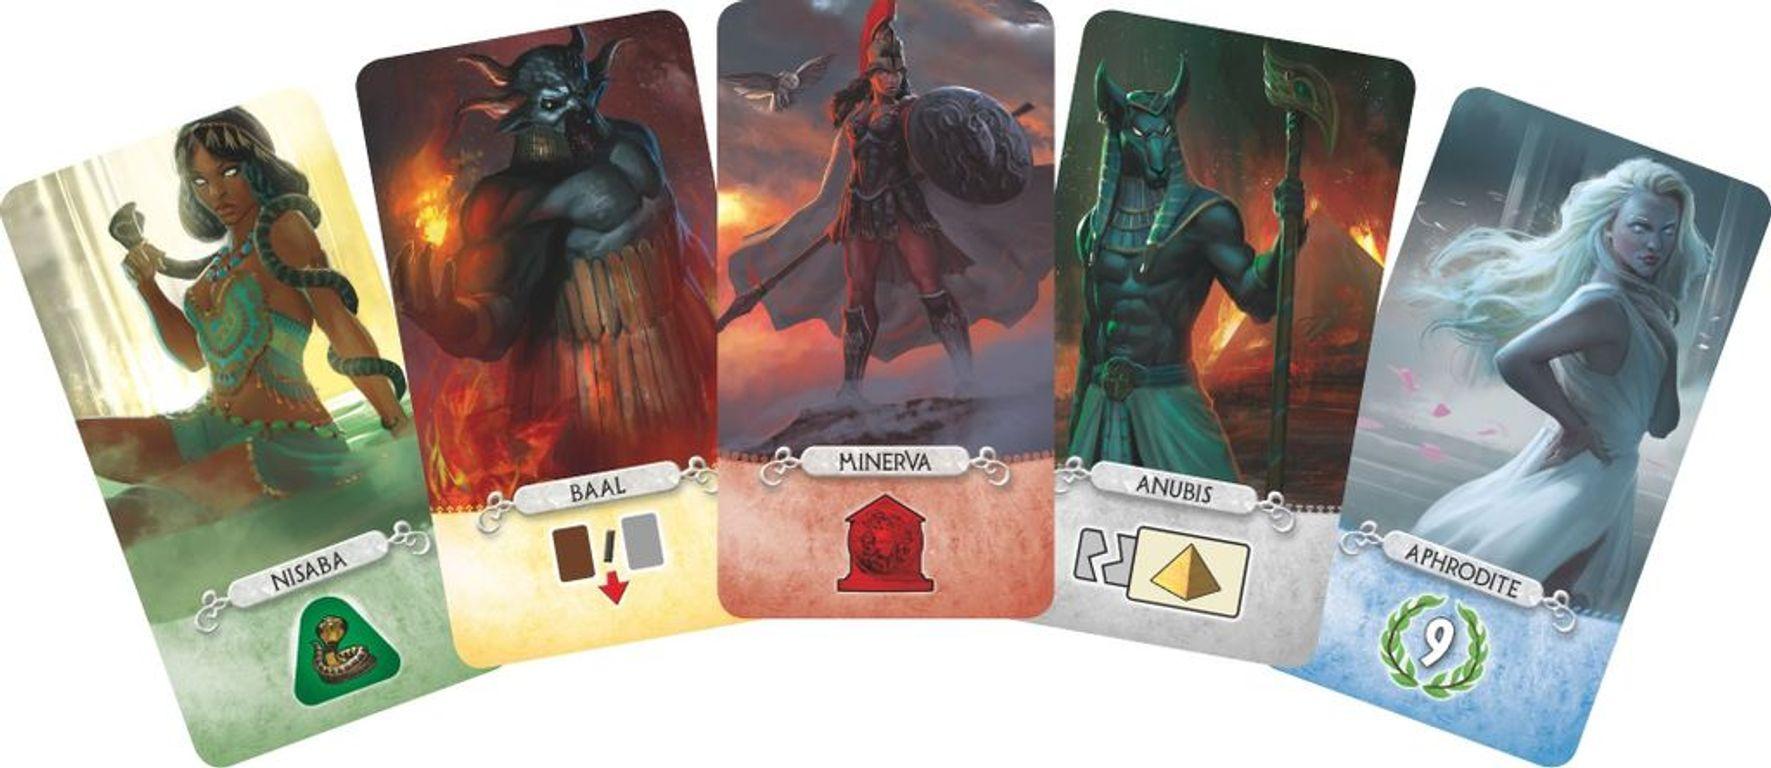 7 Wonders Duel: Pantheon cards